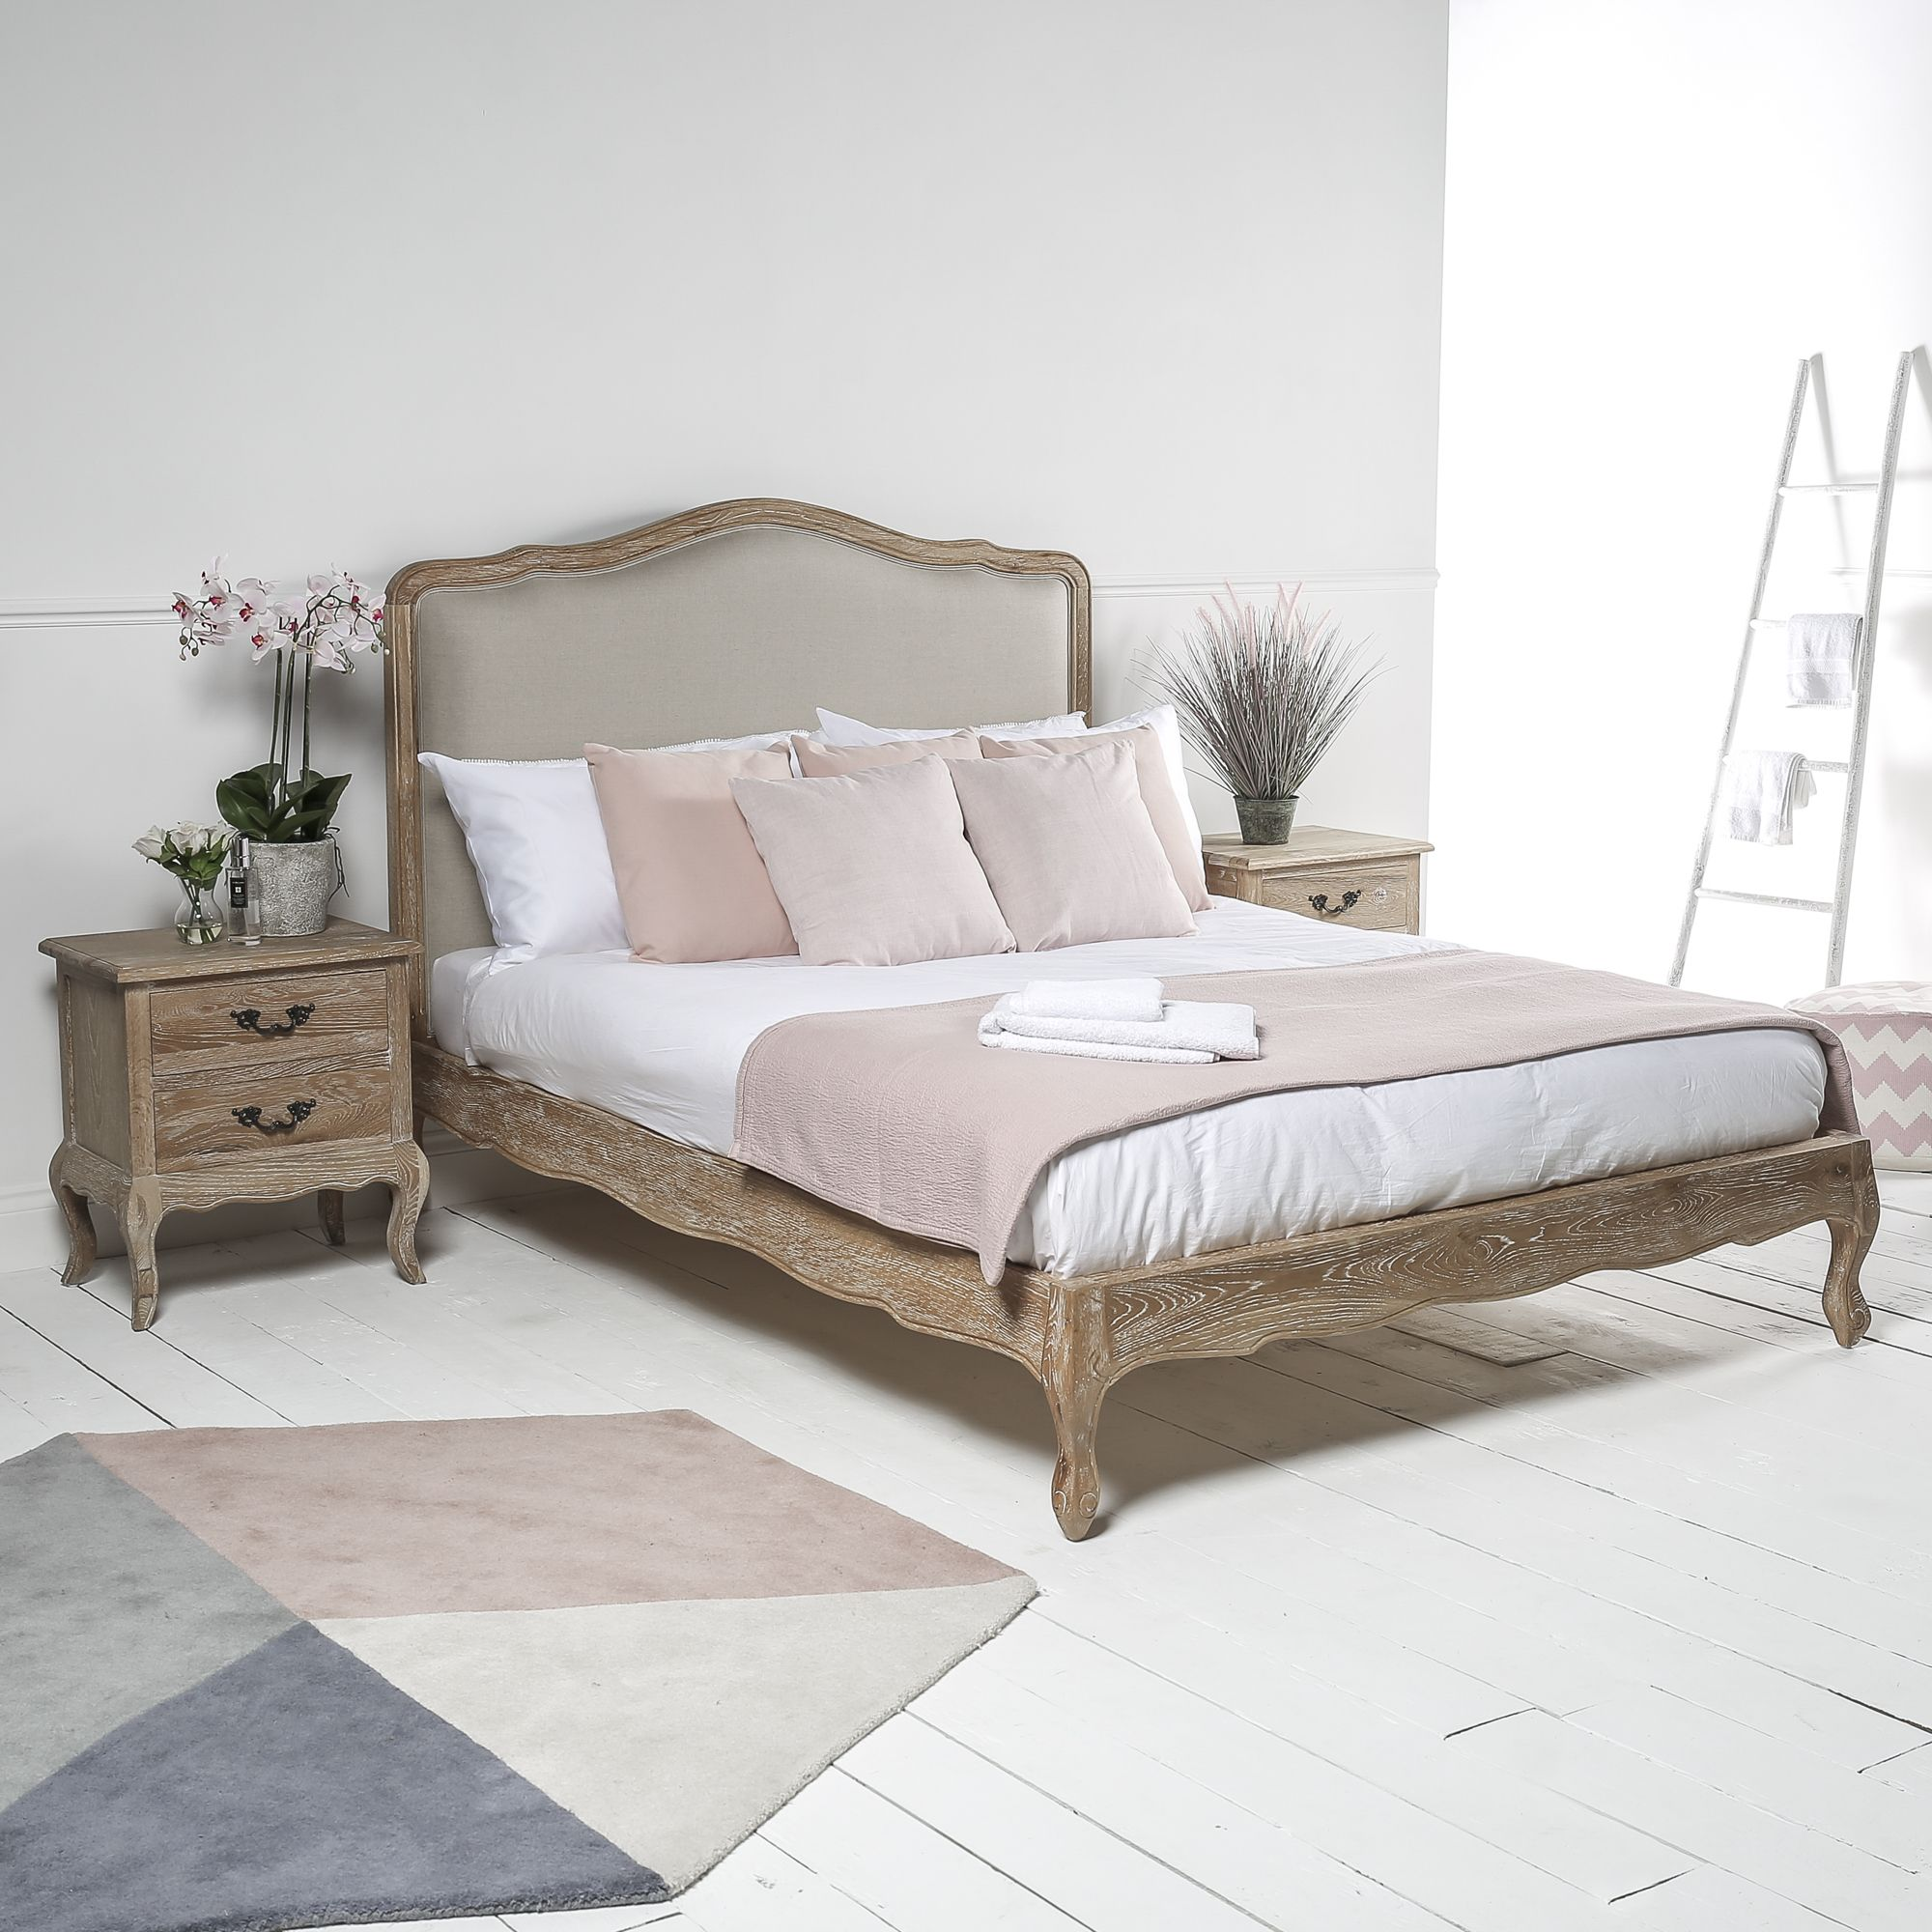 French Weathered Limed Oak Upholstered Low Foot Board Bed Super King Size Grosvenor Furniture In 2020 King Bedroom Furniture French Style Bed Furniture